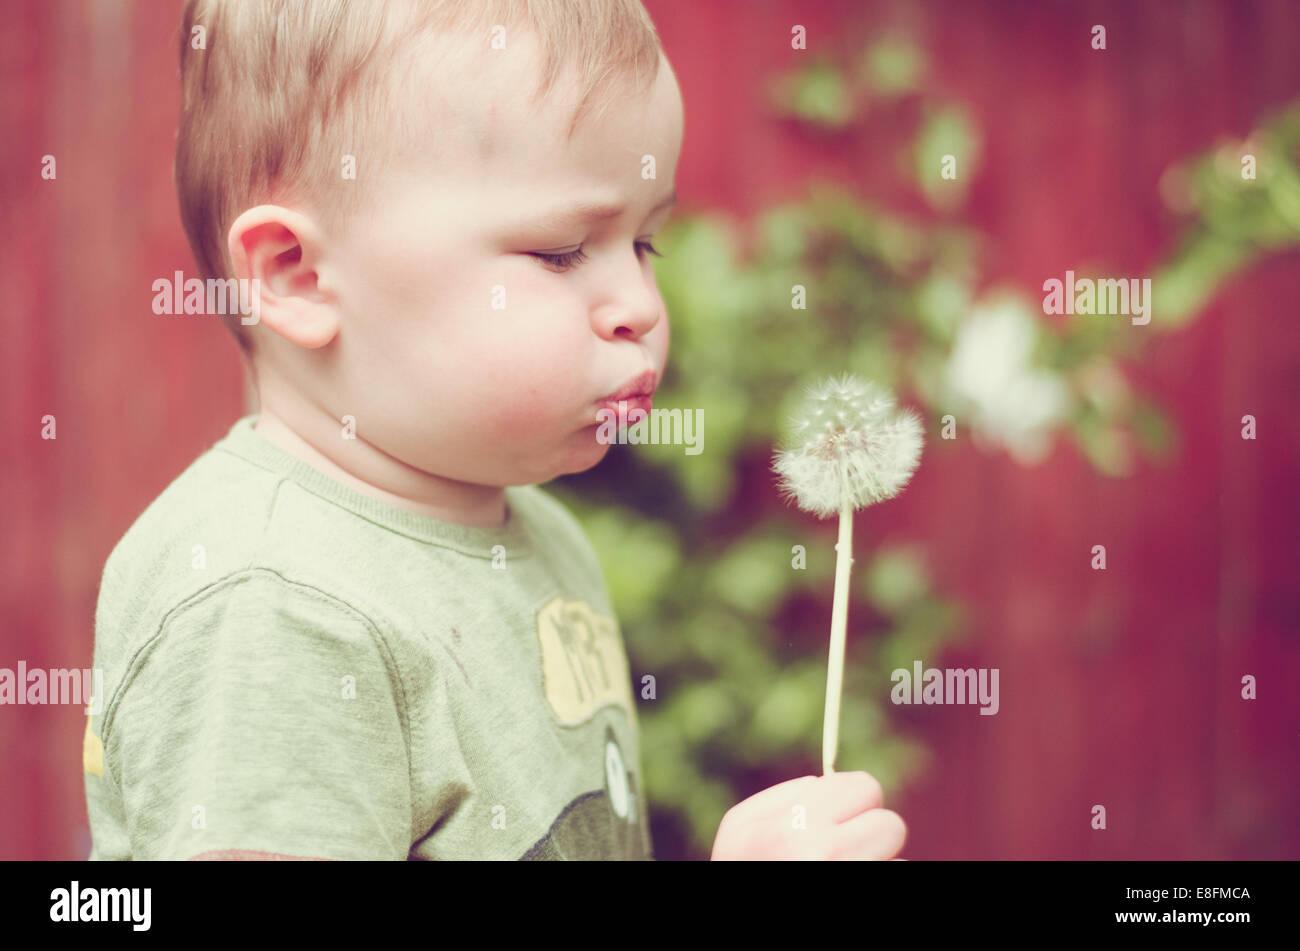 Baby Boy blowing dandelion clock Photo Stock